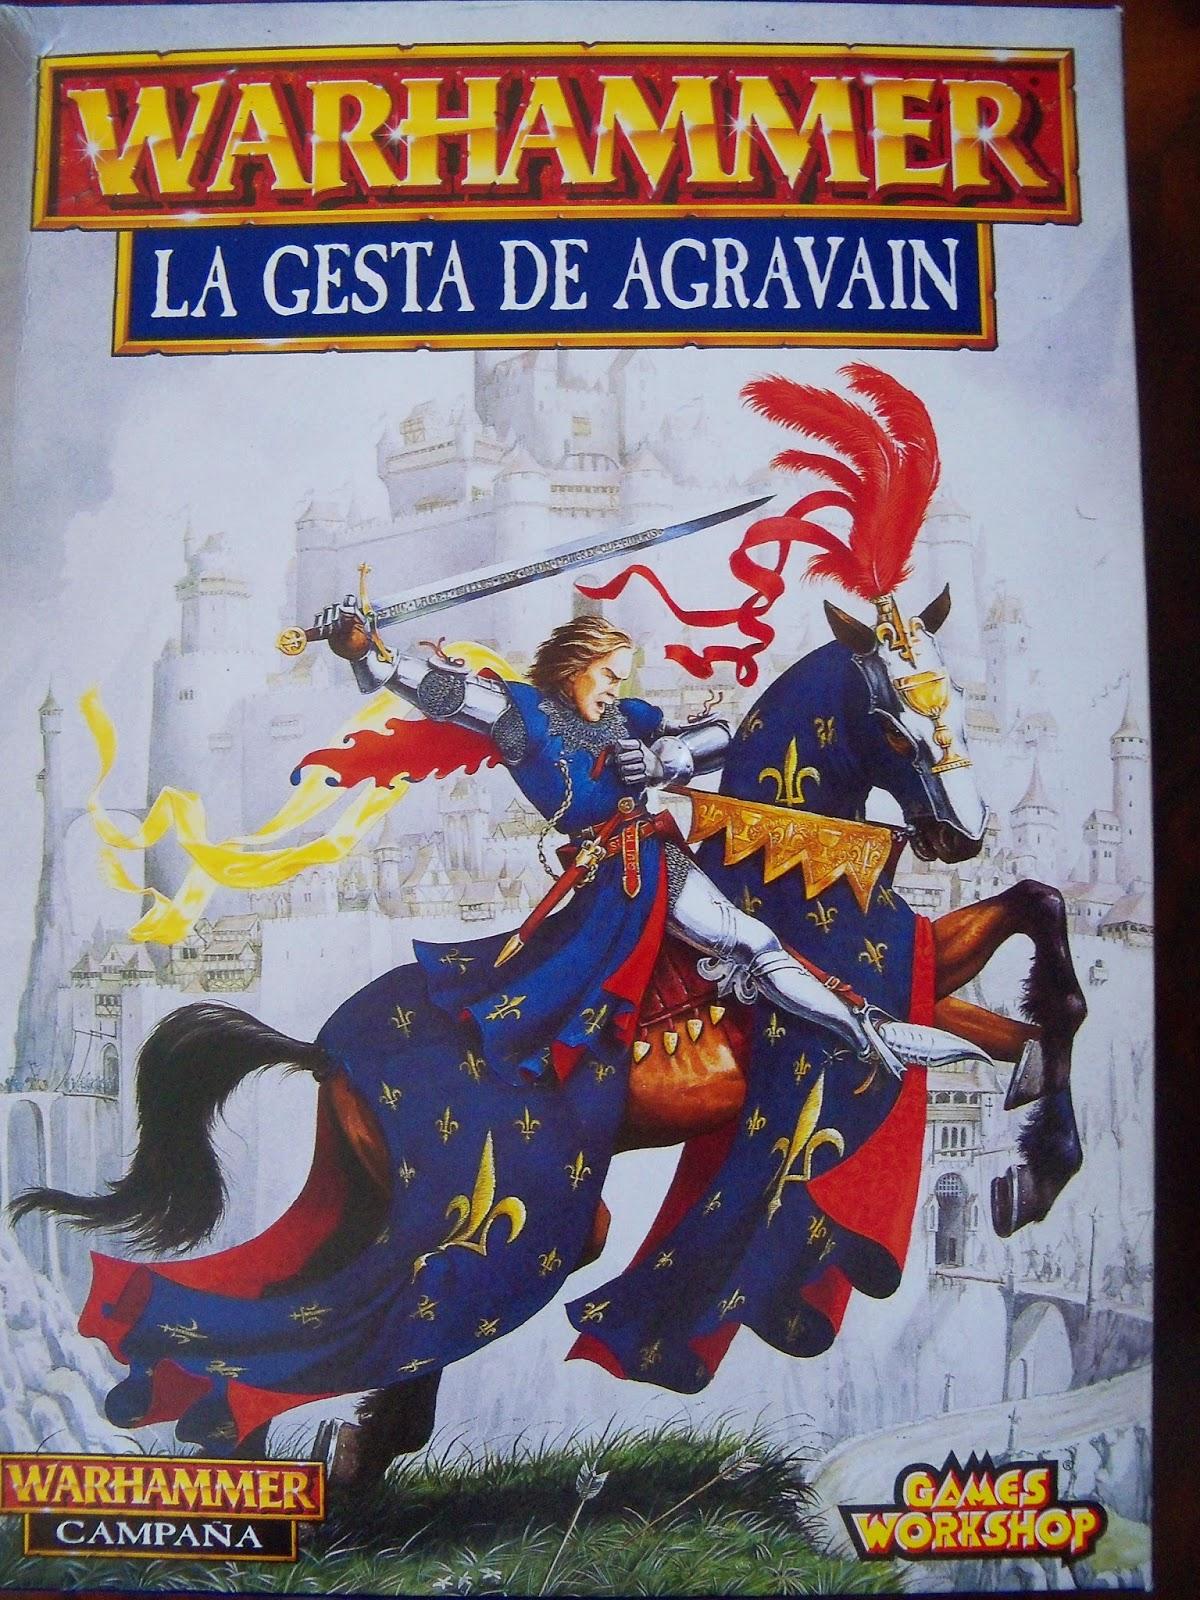 La Gesta de Agravain (1997)